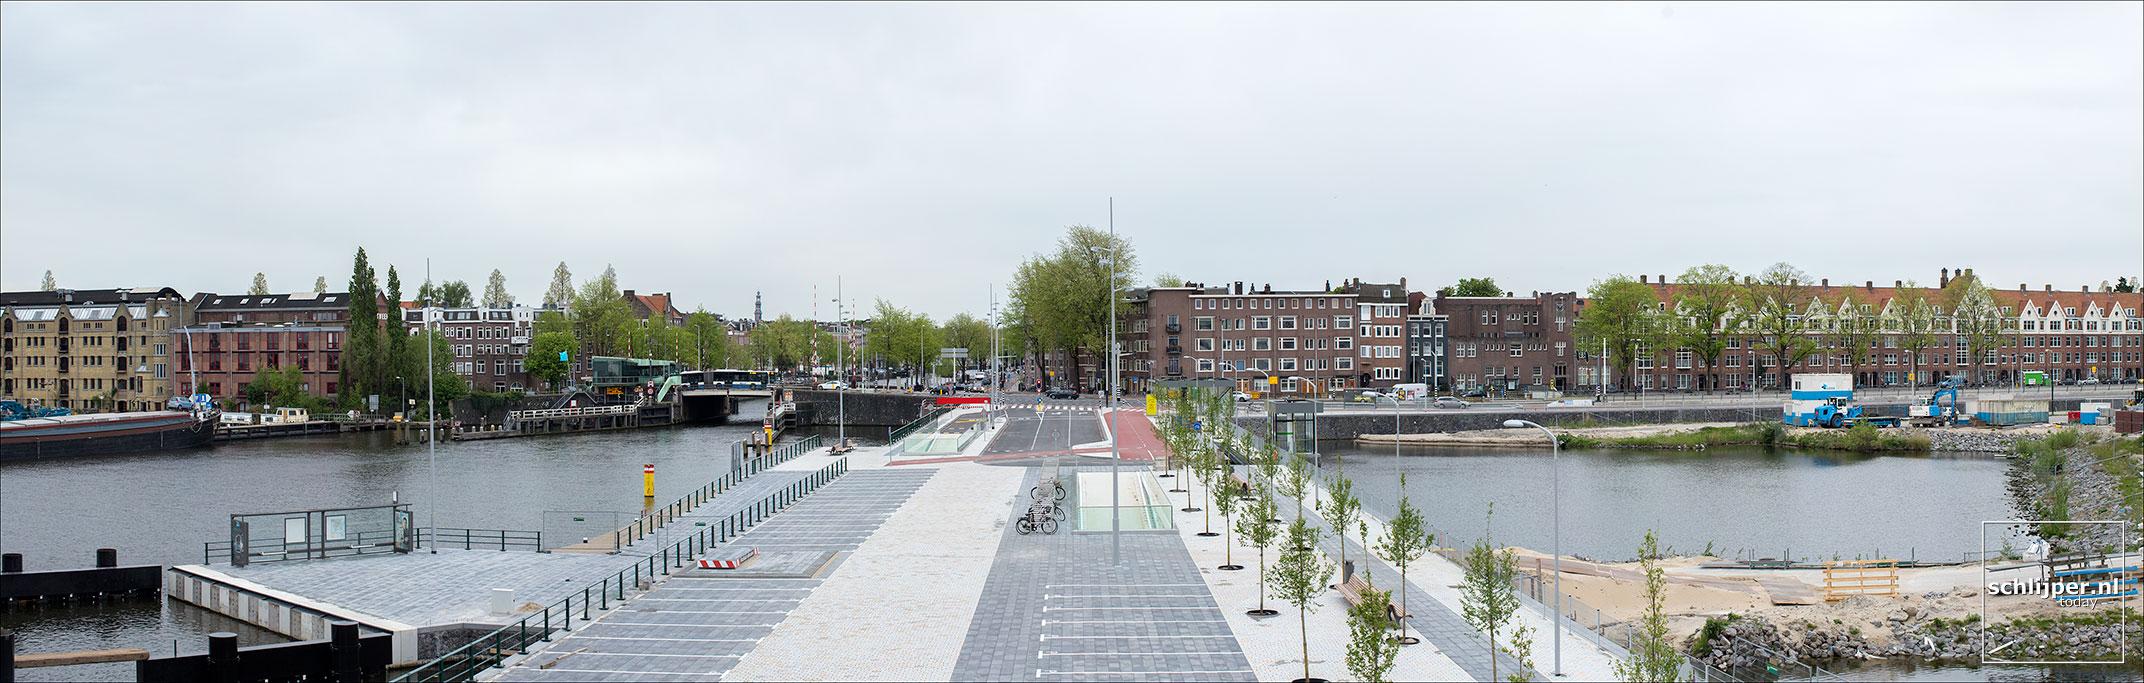 Nederland, Amsterdam, 2 mei 2018